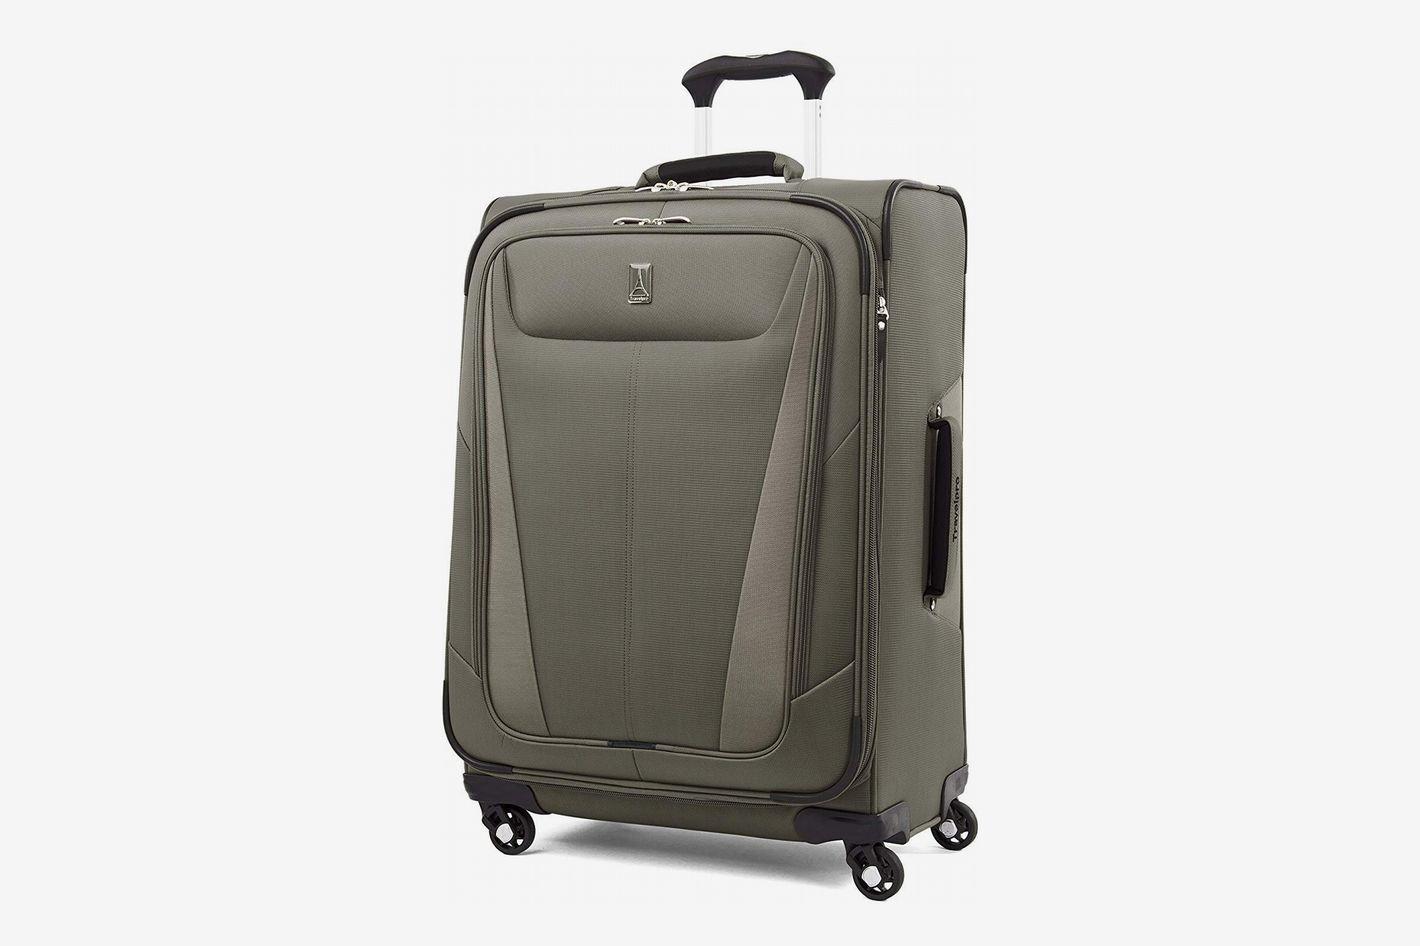 Travelpro Luggage Maxlite 5 Lightweight Expandable Suitcase, Checked-Medium